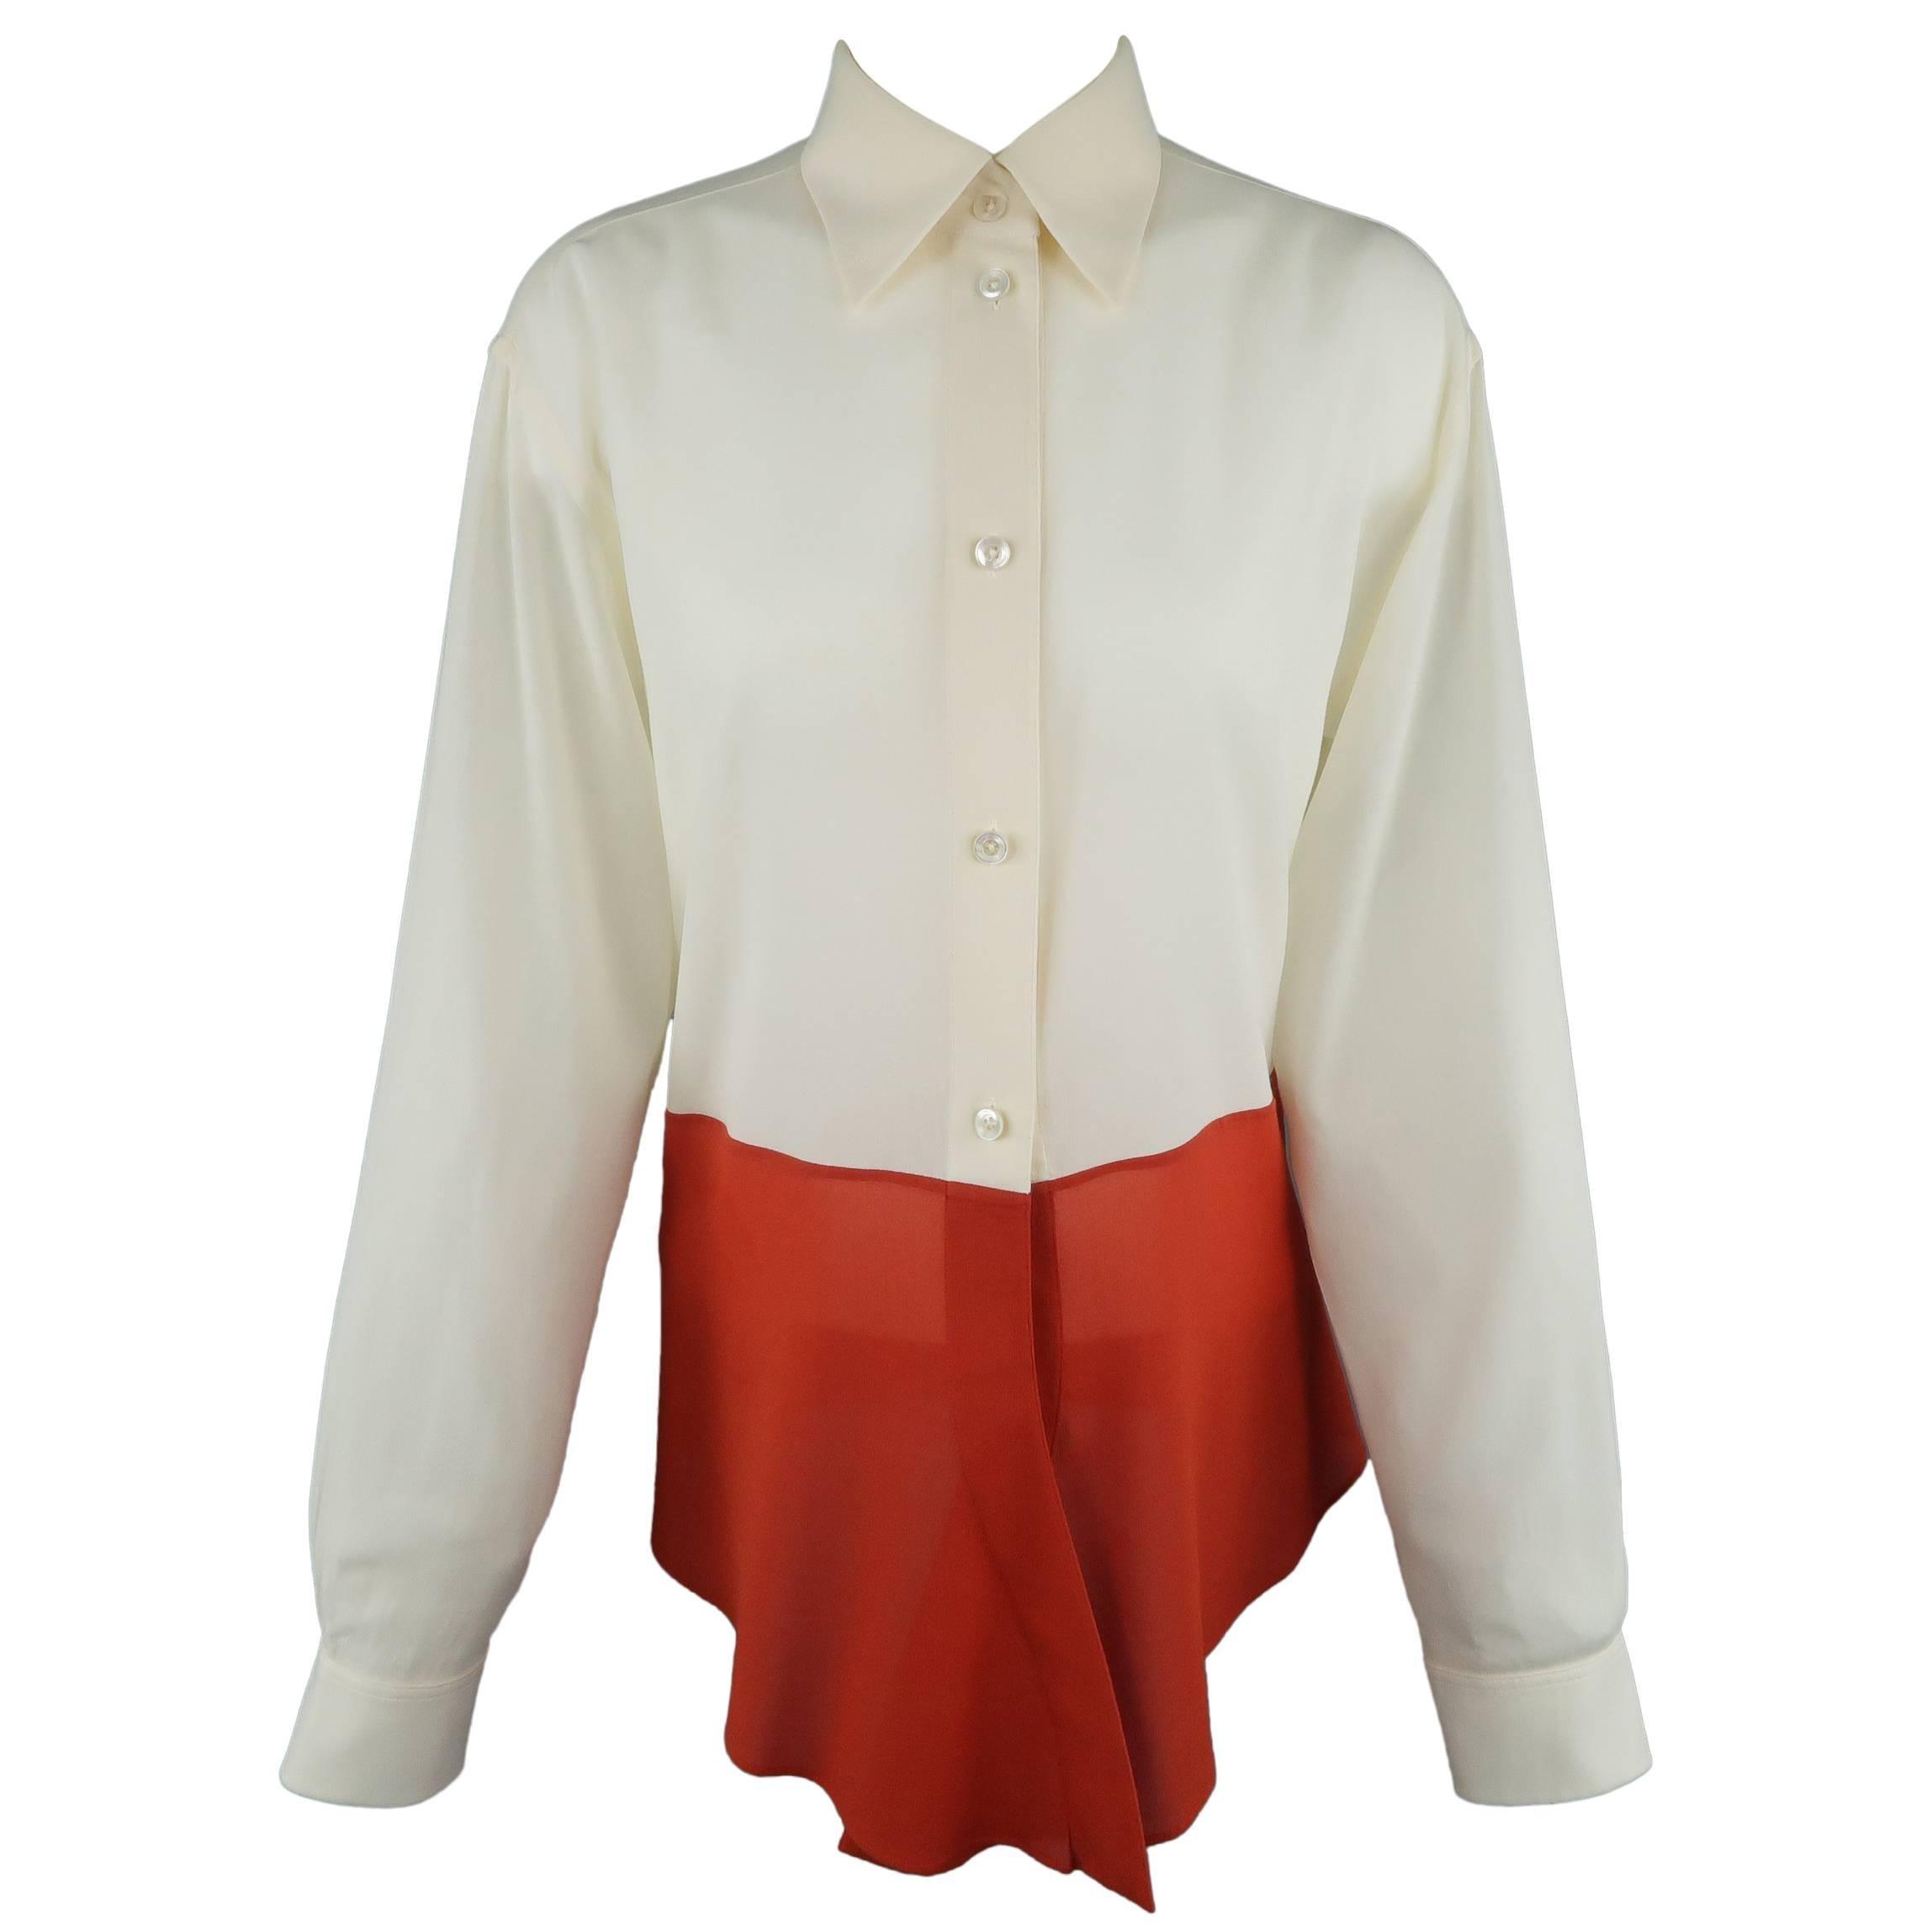 Hermes Vintage Beige and Orange Color Block Silk Chiffon Blouse